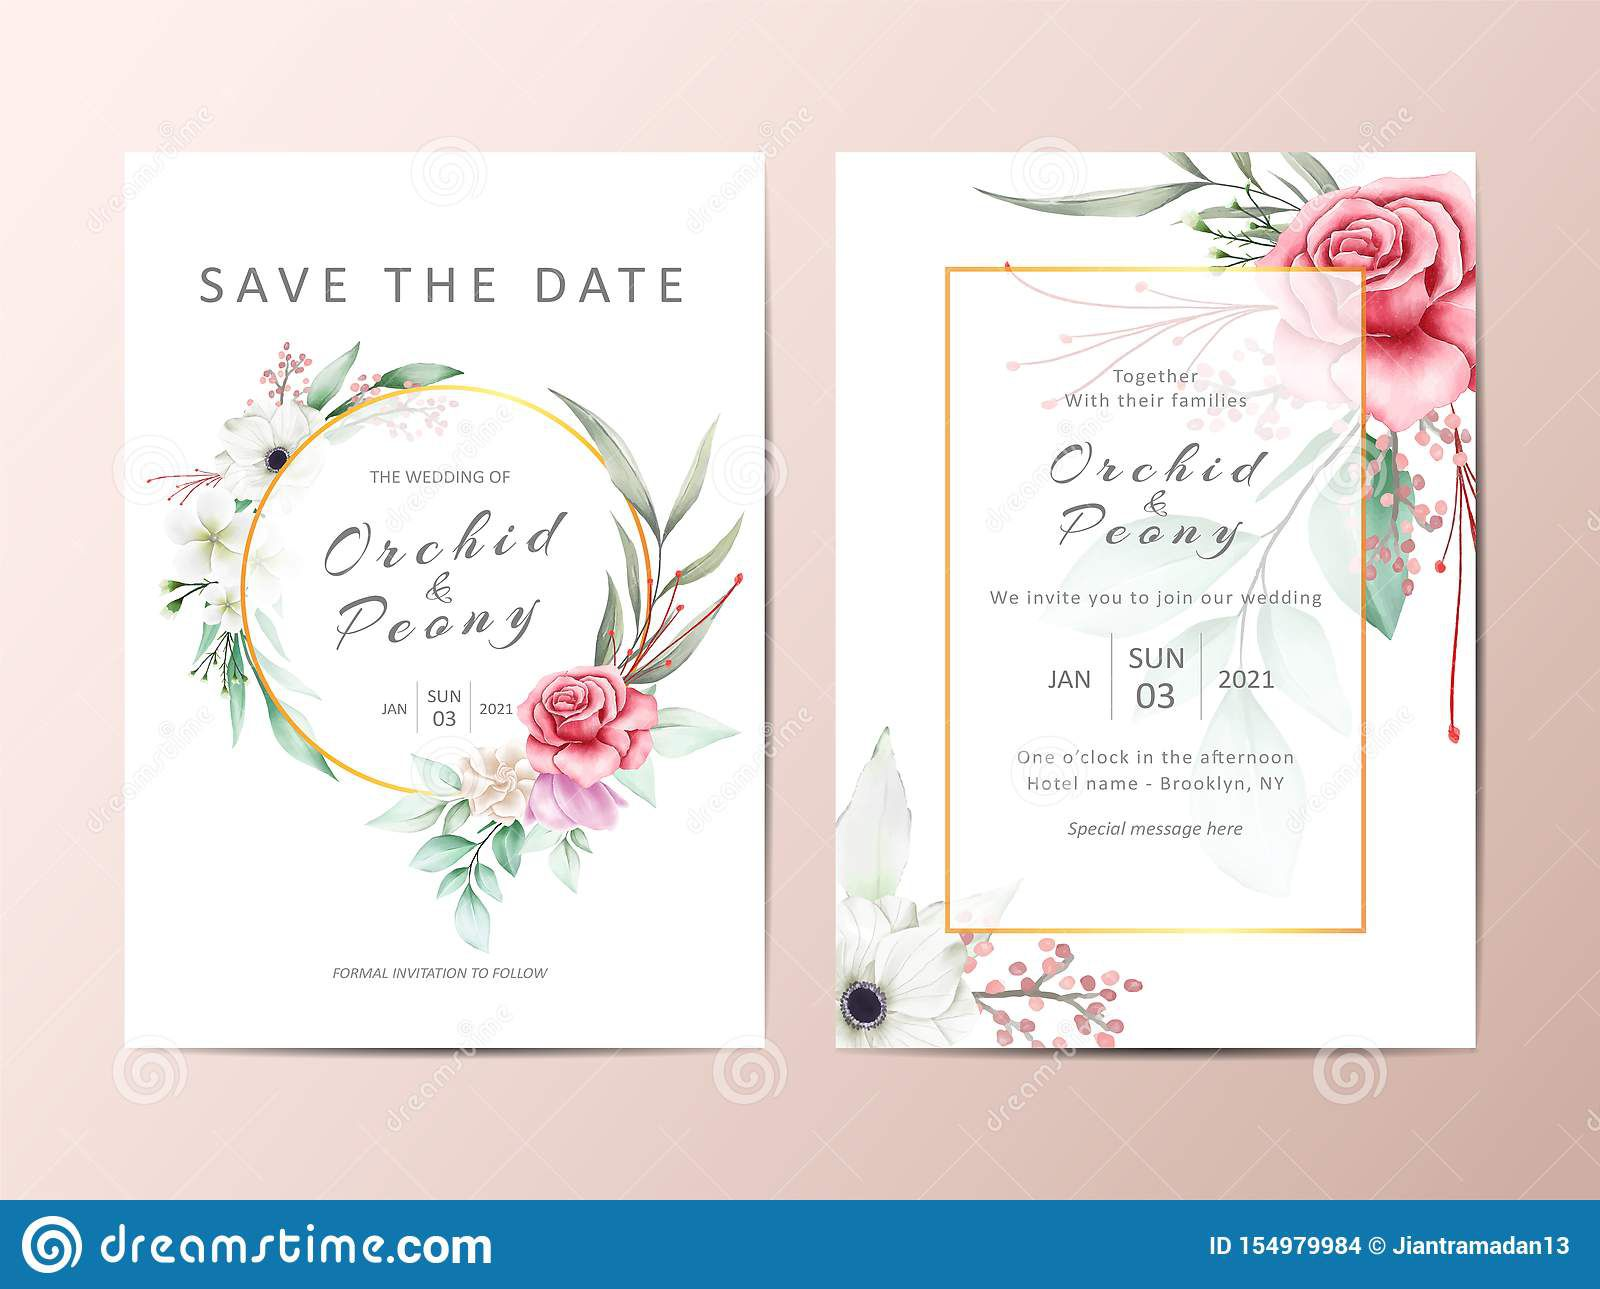 004 Rare Editable Wedding Invitation Template Idea  Templates Tamil Card Free Download Psd OnlineFull